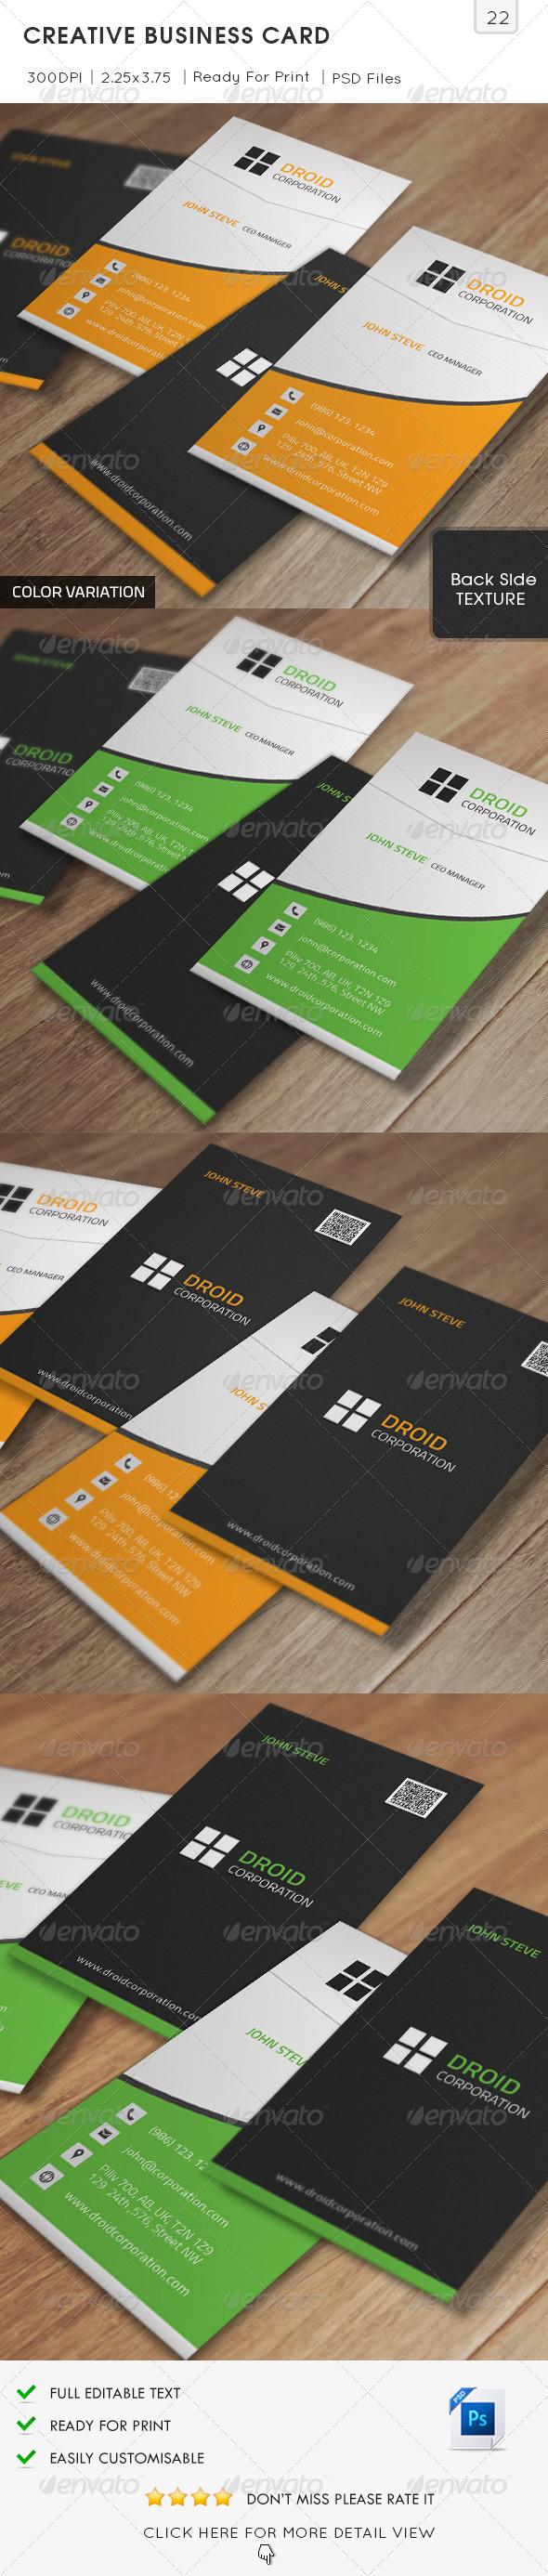 Creative Business Card v22 - Creative Business Cards